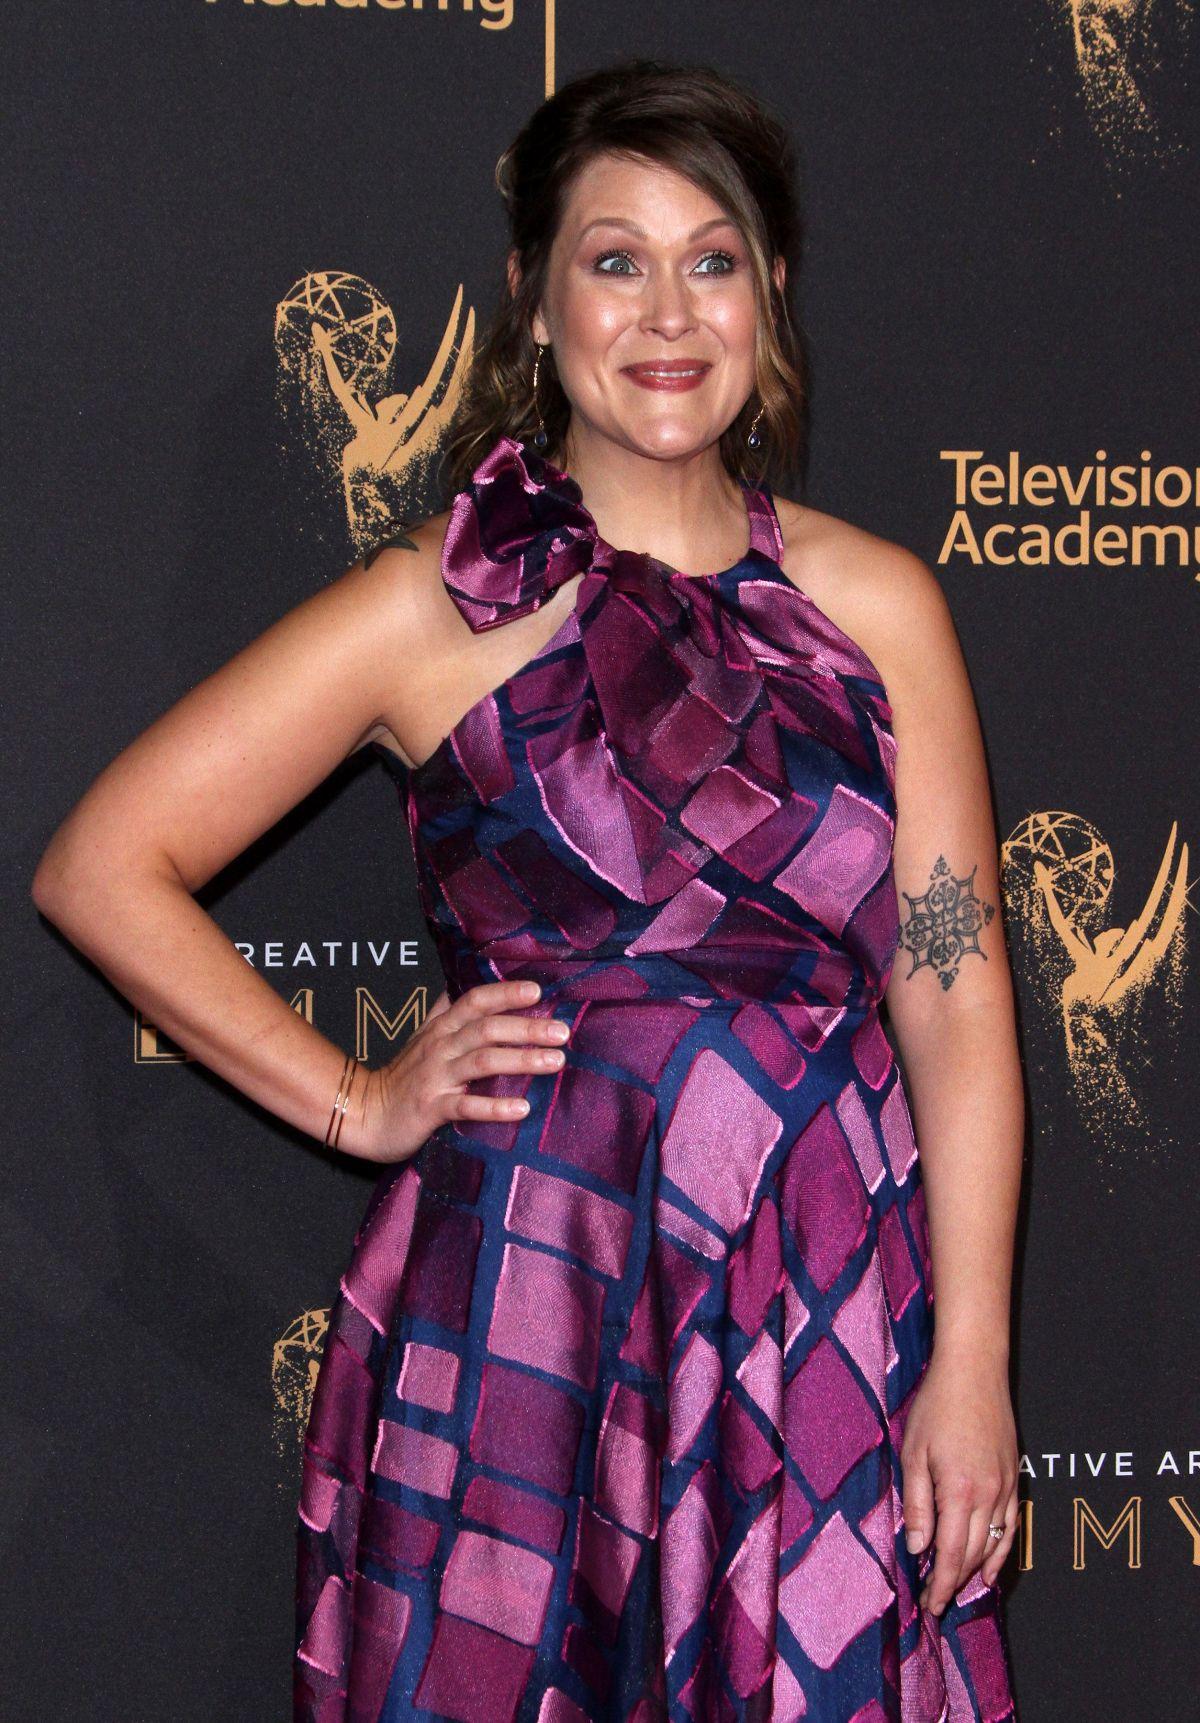 AMBER NASH at Creative Arts Emmy Awards in Los Angeles 09/10/2017